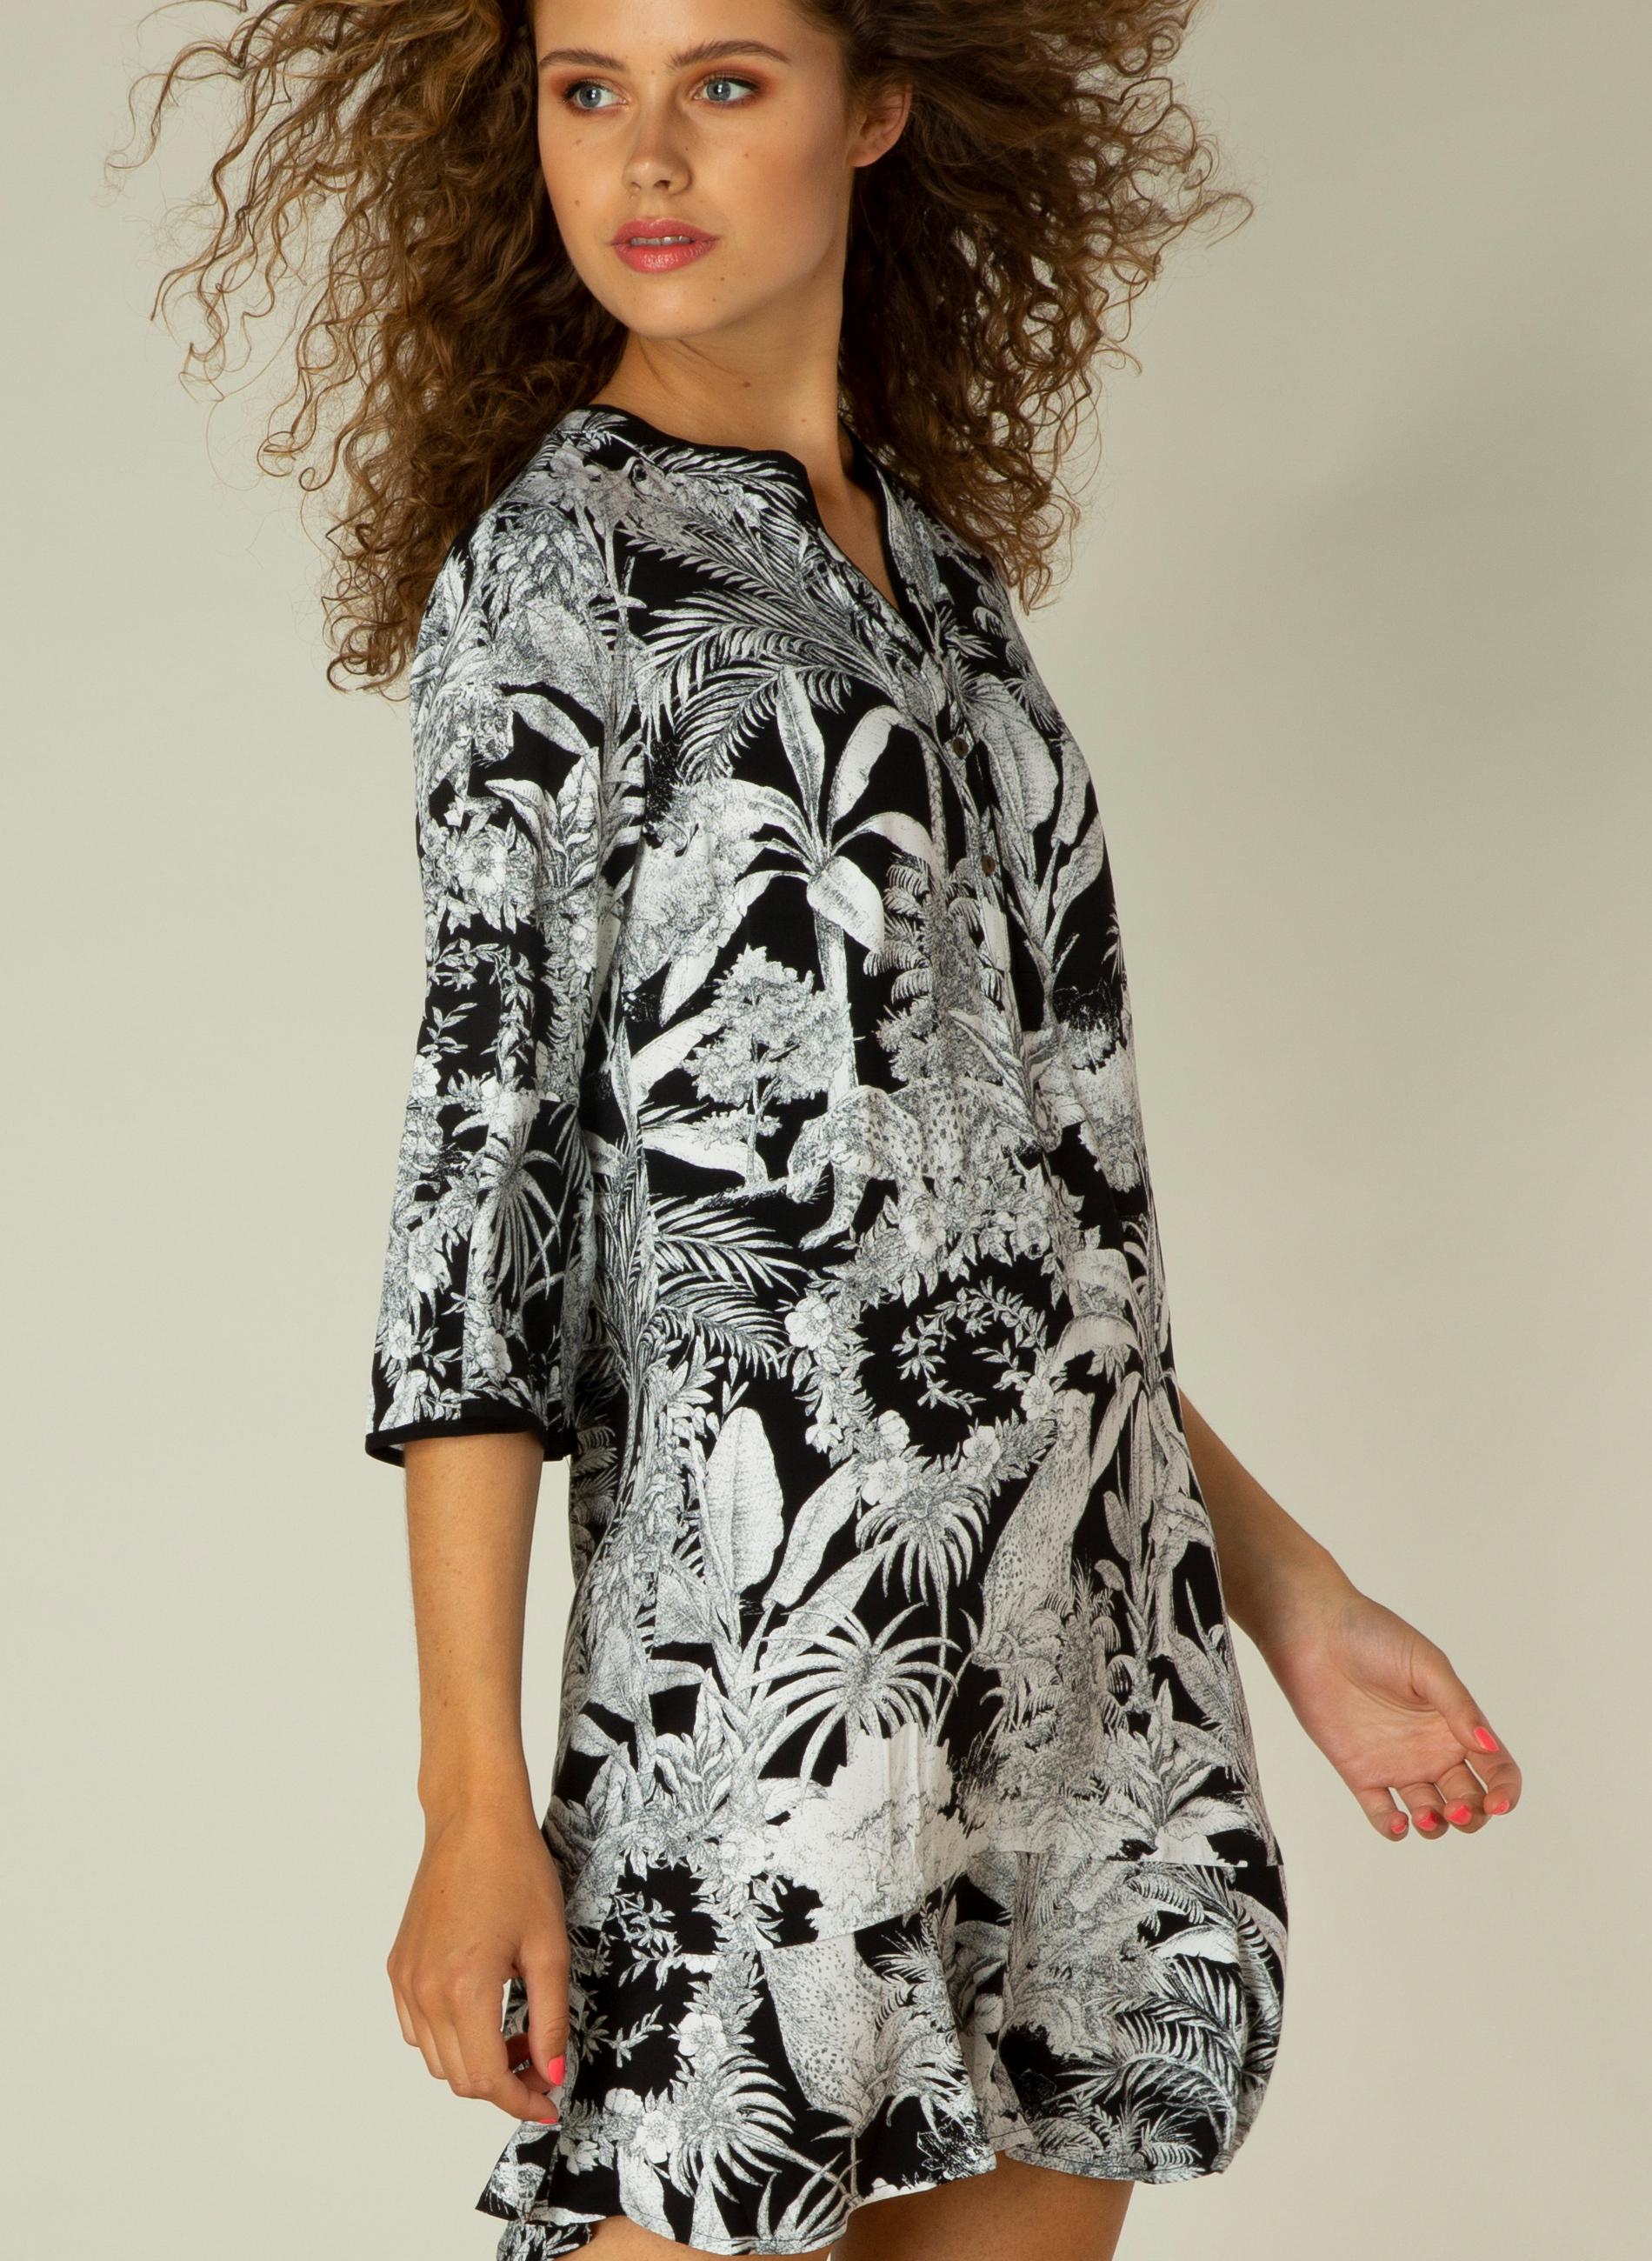 Yest jurk Imae 95 cm